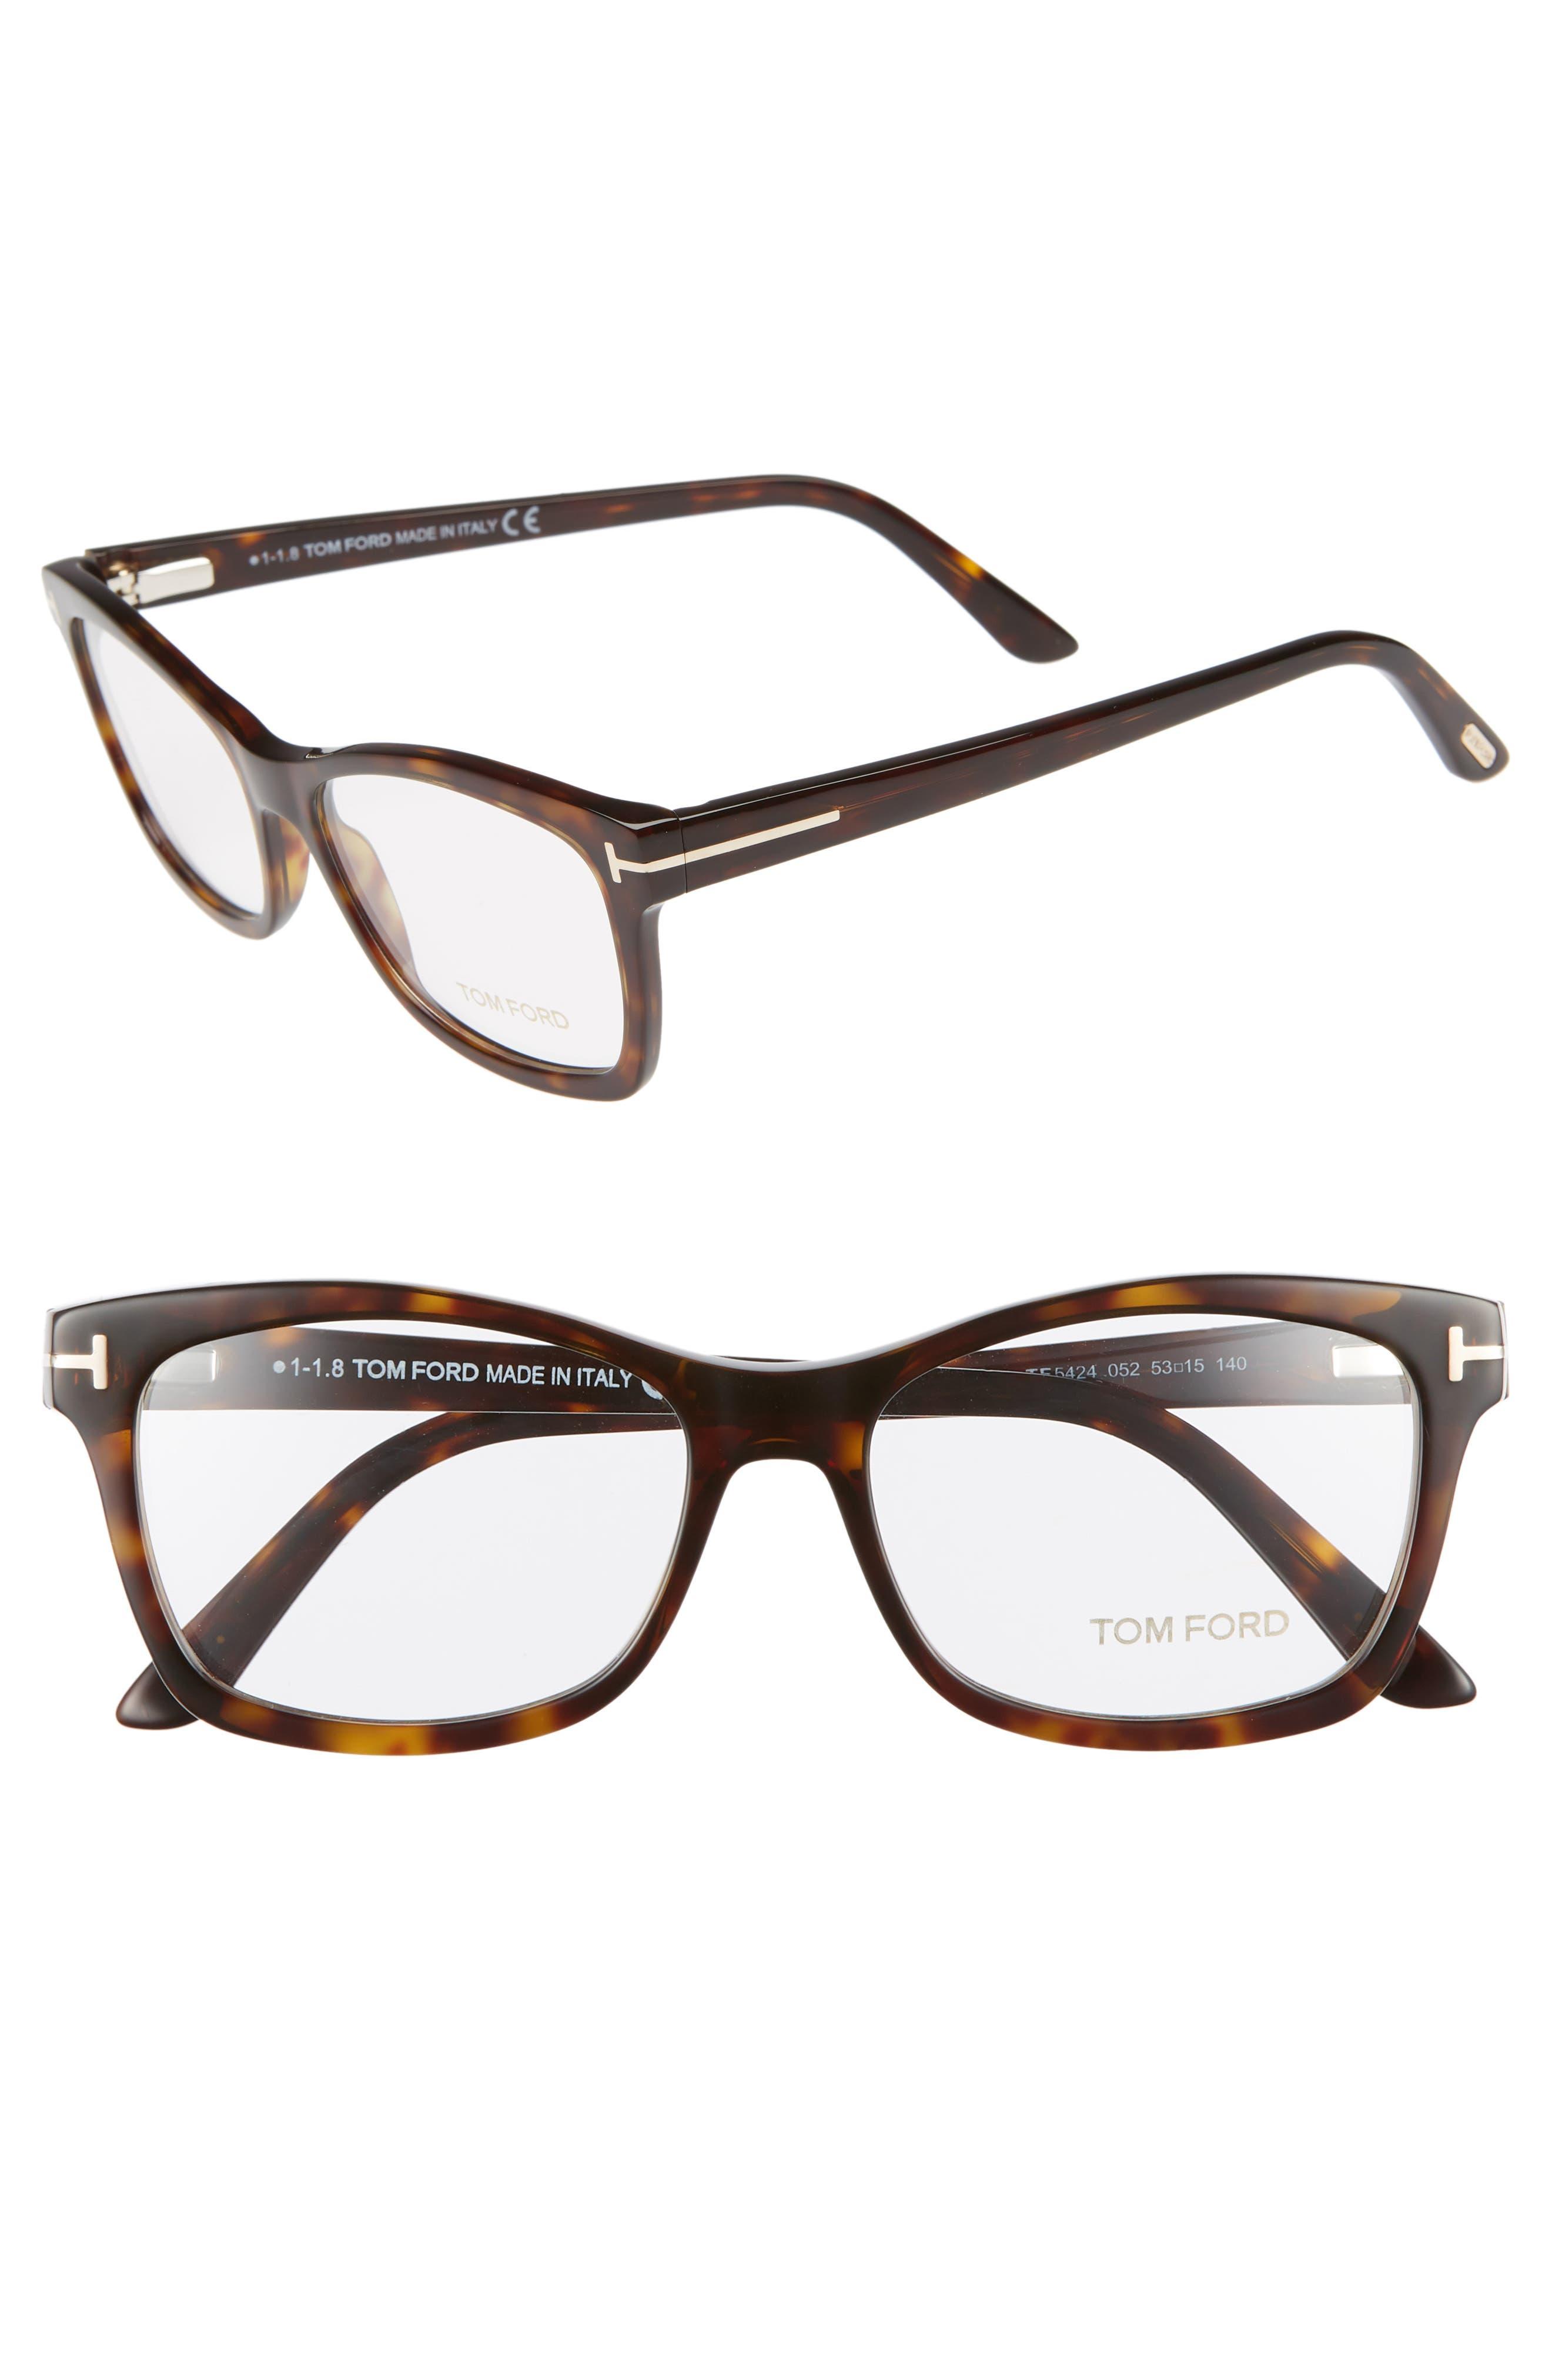 53Mm Optical Glasses - Shiny Classic Dark Havana